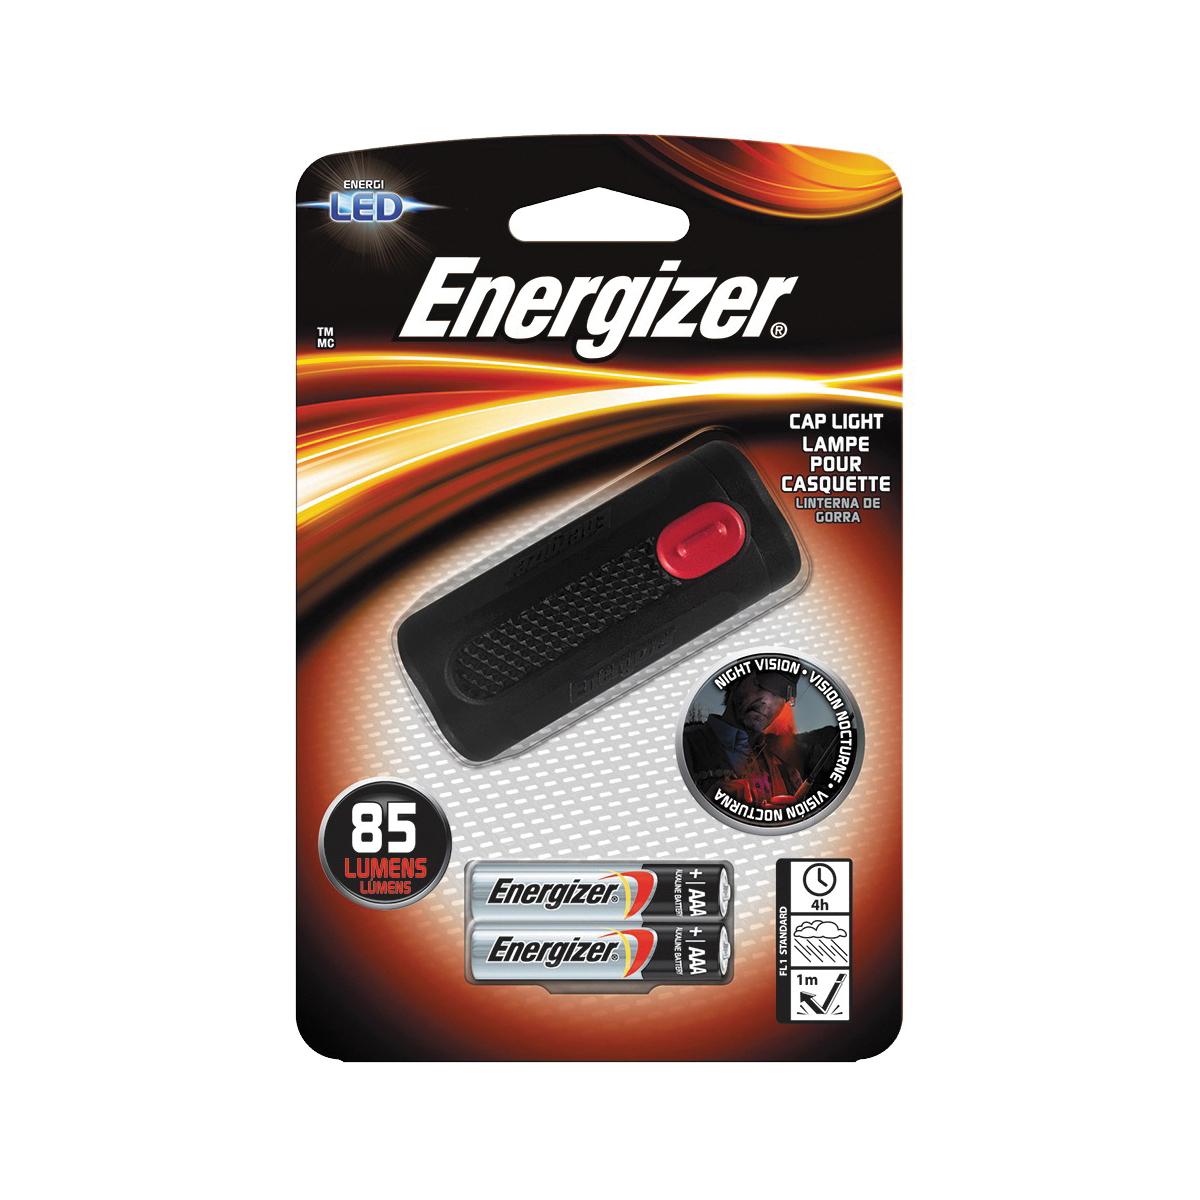 Picture of Energizer ENCAP22E Cap Light, AAA Battery, Alkaline Battery, LED Lamp, 85 Lumens, 4 hr Run Time